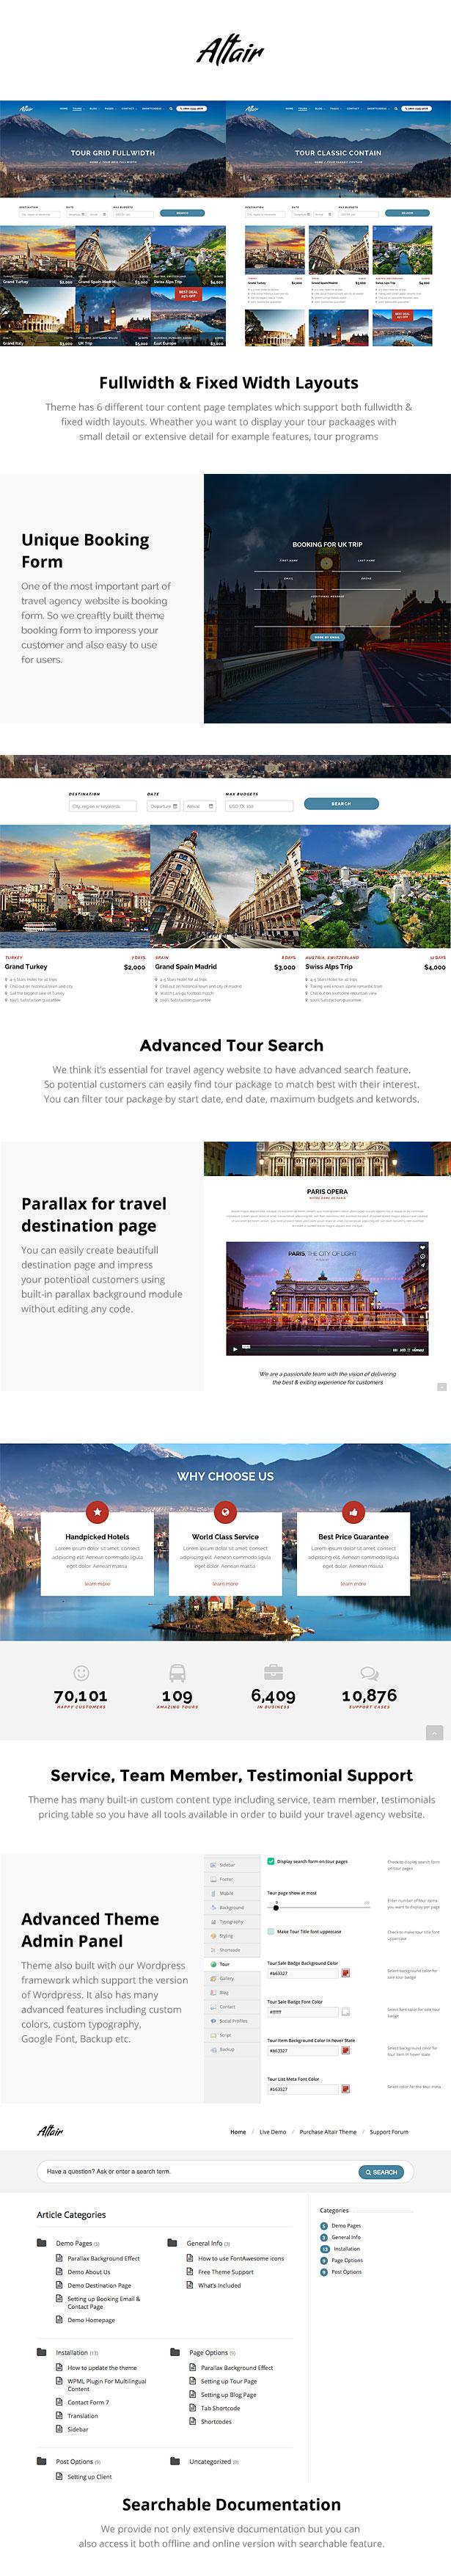 AltairFeatures - Altair   Travel Agency WordPress